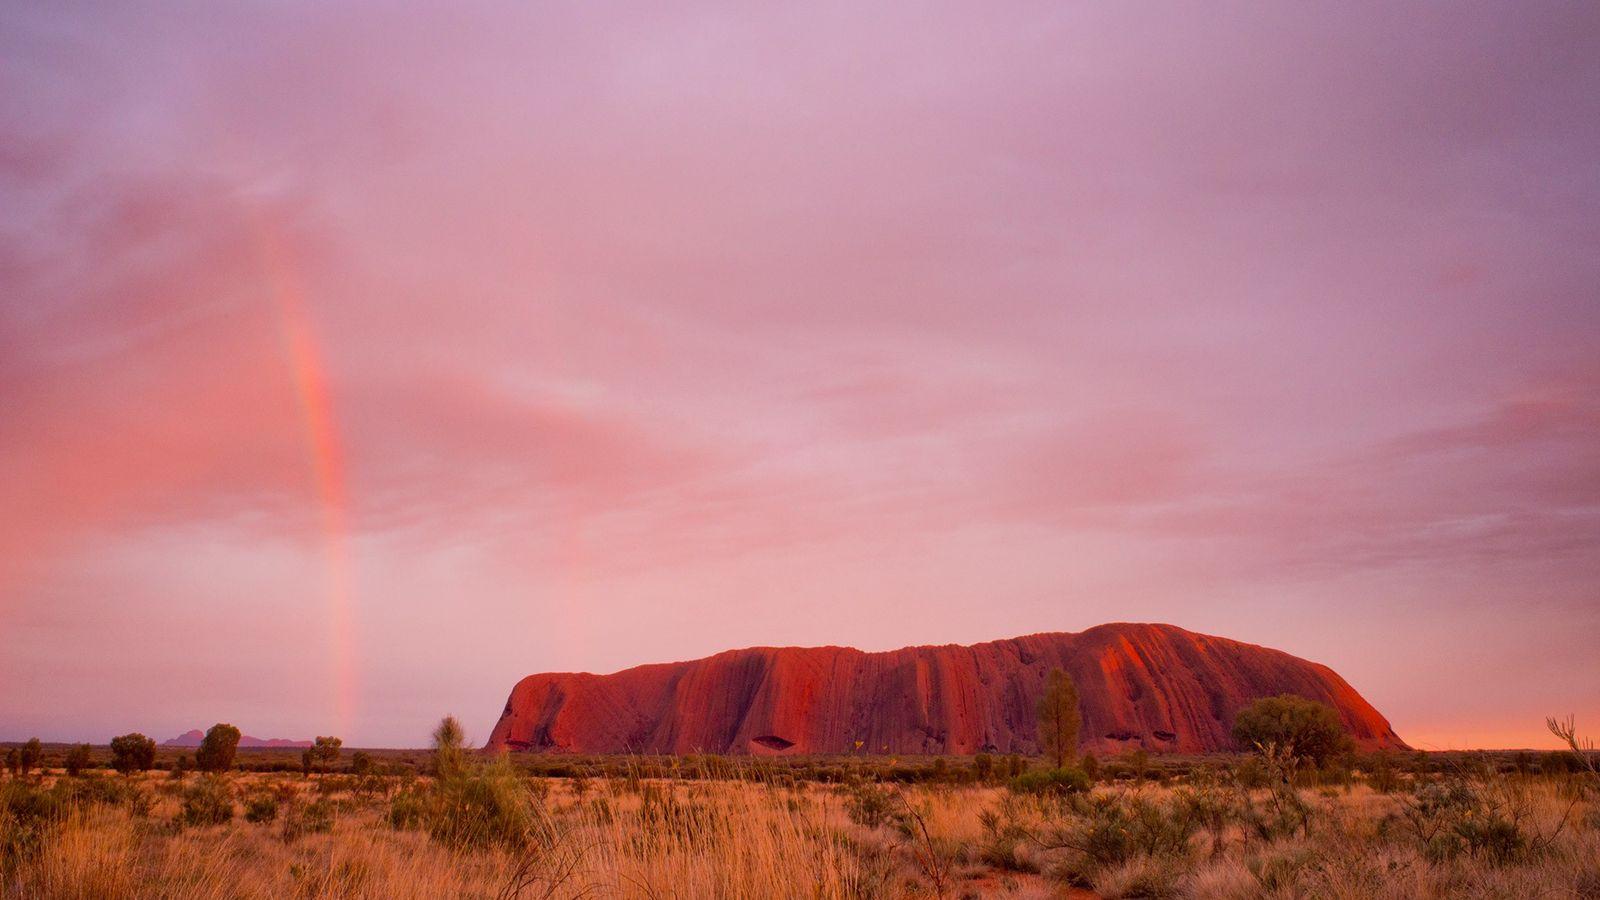 Uluru, a massive sandstone monolith in central Australia sacred to the local Aboriginal peoples, will soon ...